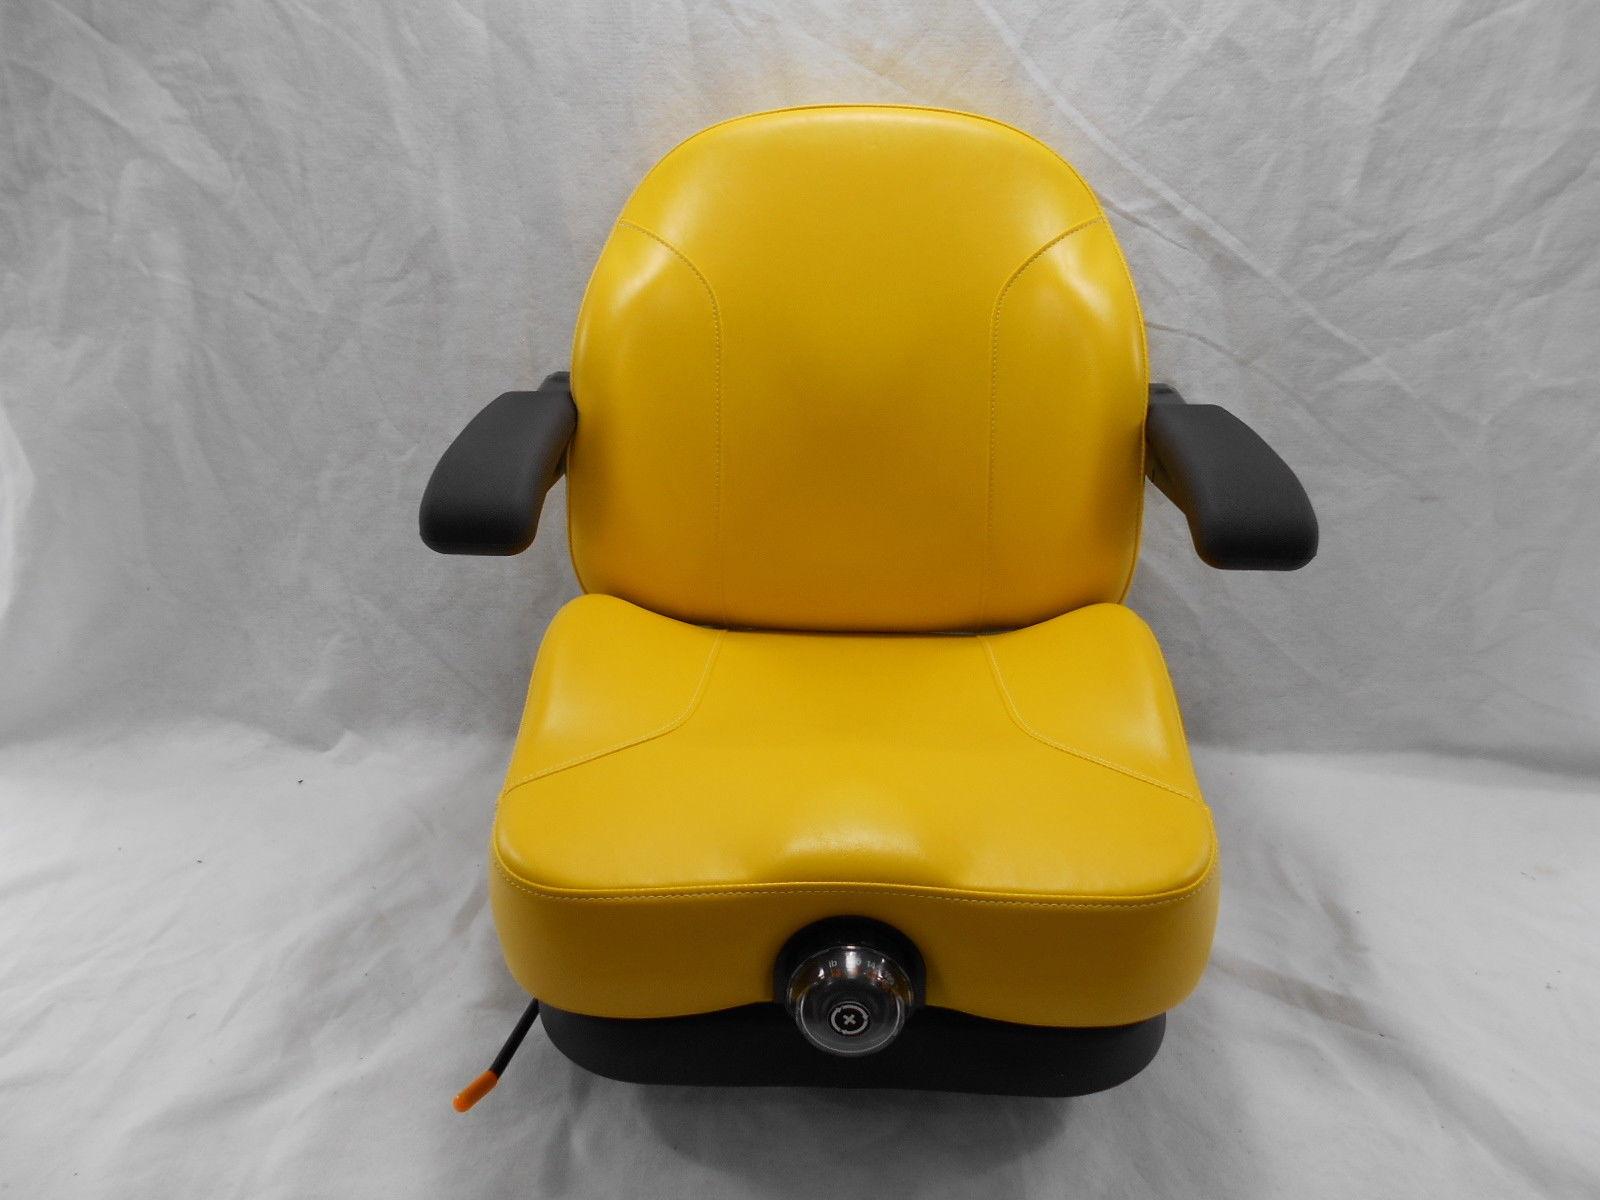 YELLOW ULTRA RIDE SUSPENSION SEAT I3M FITS JOHN DEERE ZERO TURN